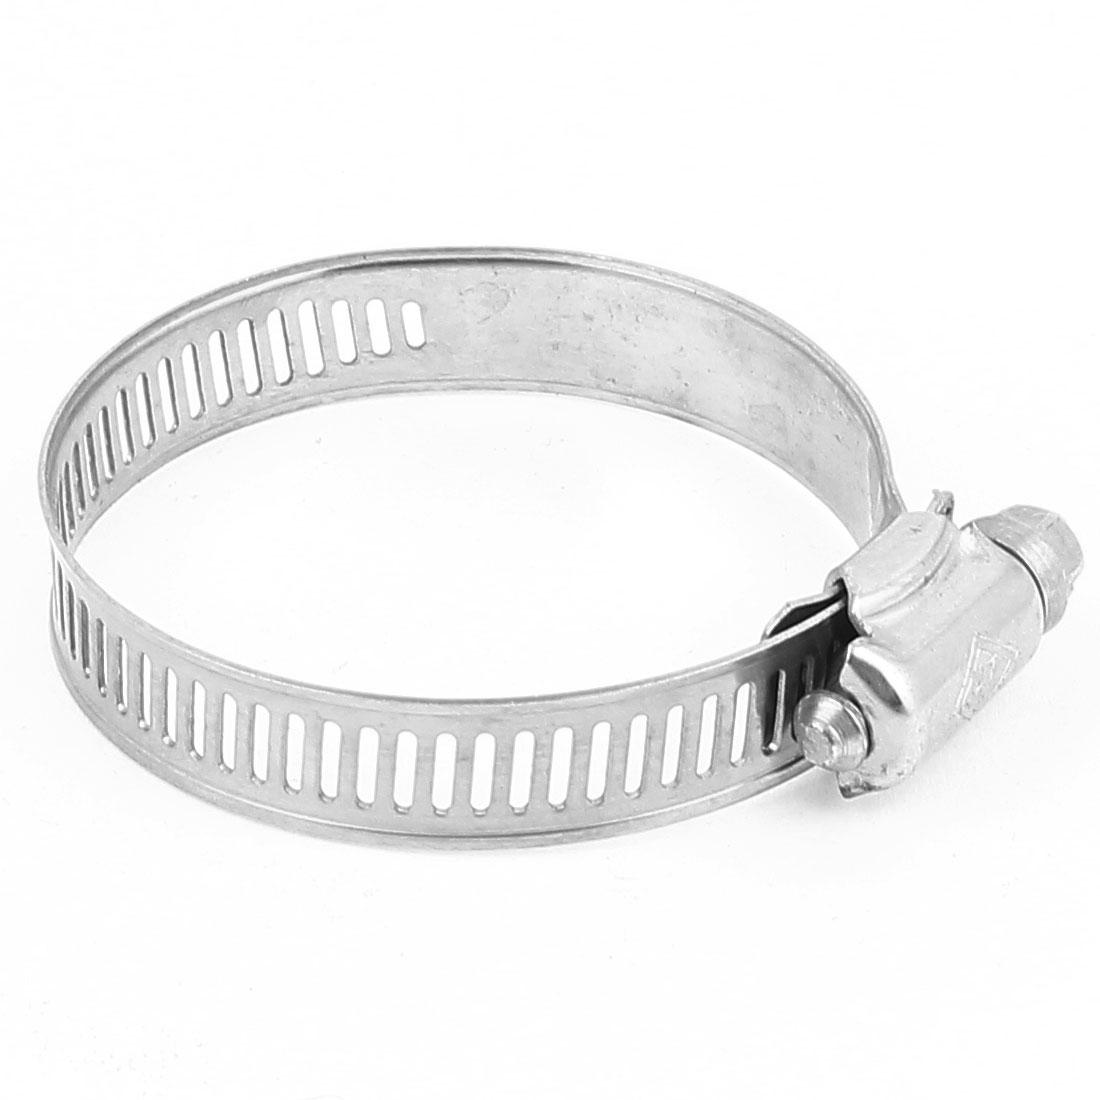 33-57mm/1.3-2.2in Adjustable Worm Gear Hose Clamp Hoop Silver Tone